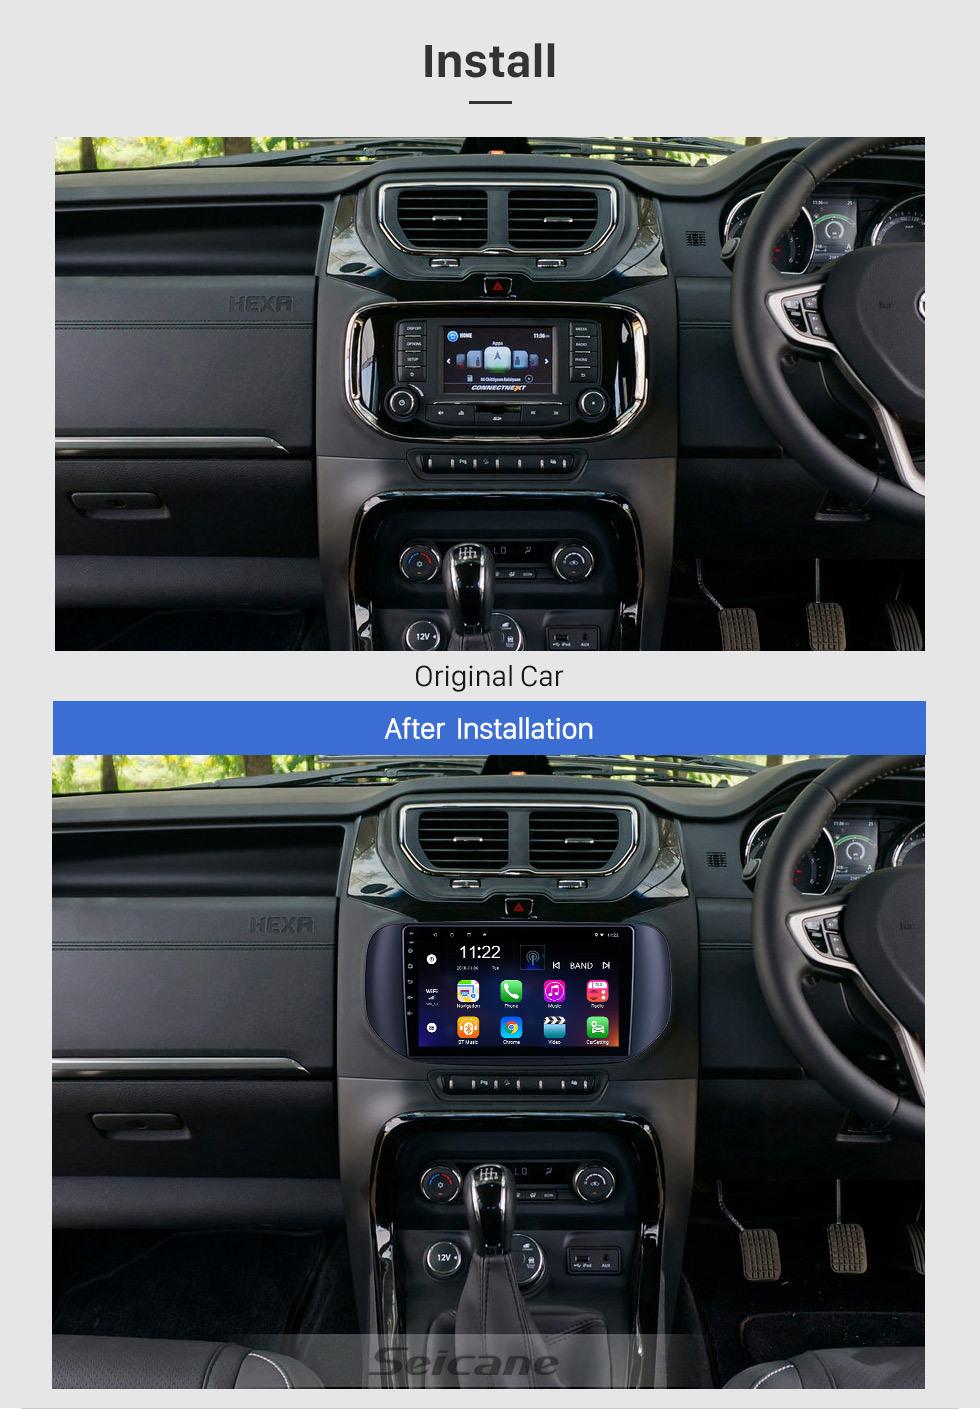 Seicane OEM Android 10.0 para 2018 Tata Hexa RHD Radio con Bluetooth 9 pulgadas HD Pantalla táctil Sistema de navegación GPS compatible con Carplay